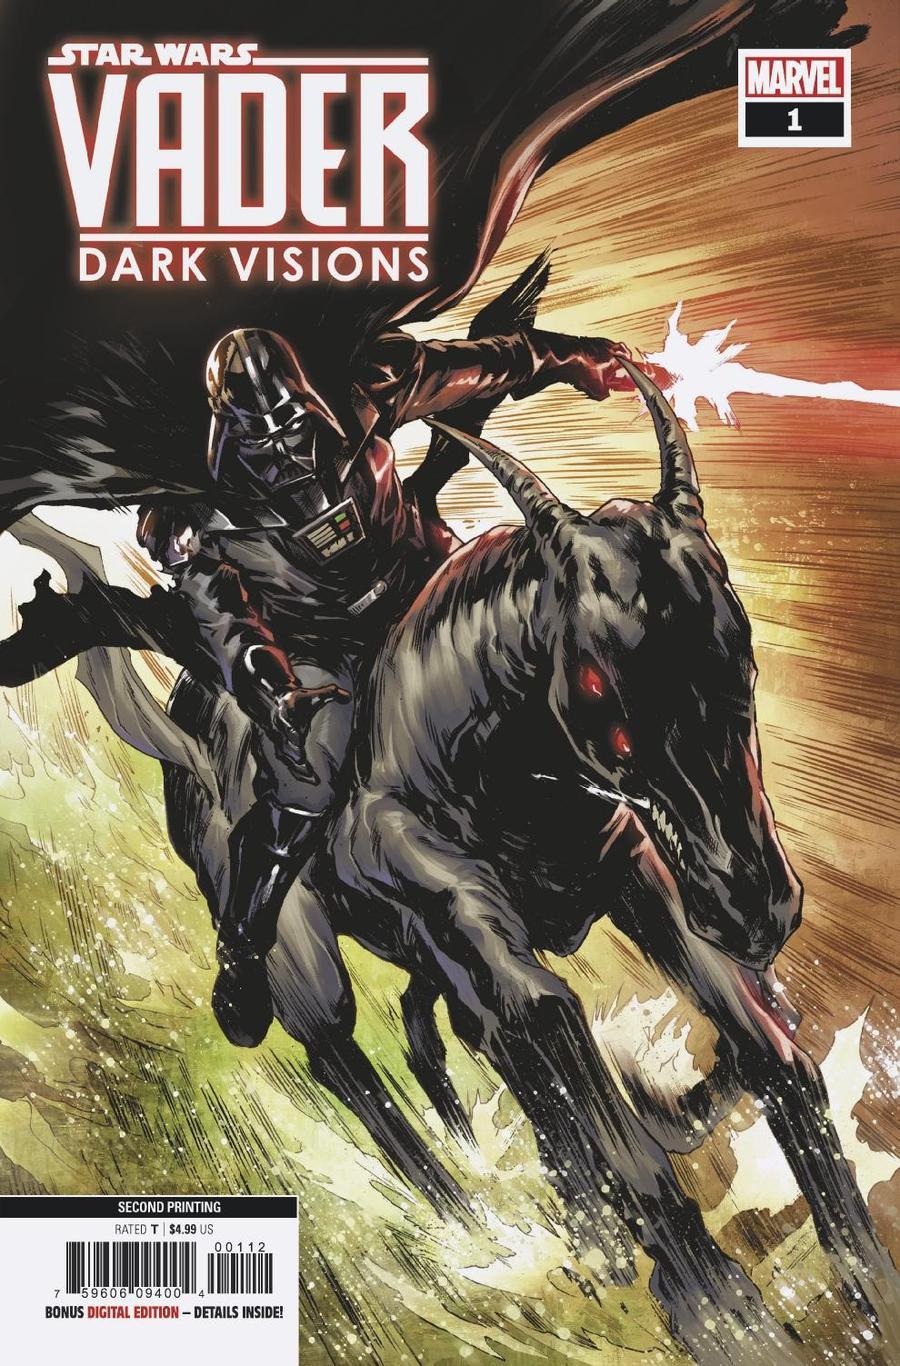 Star Wars: Vader – Dark Visions #1 – 2nd Printing – CovrPrice